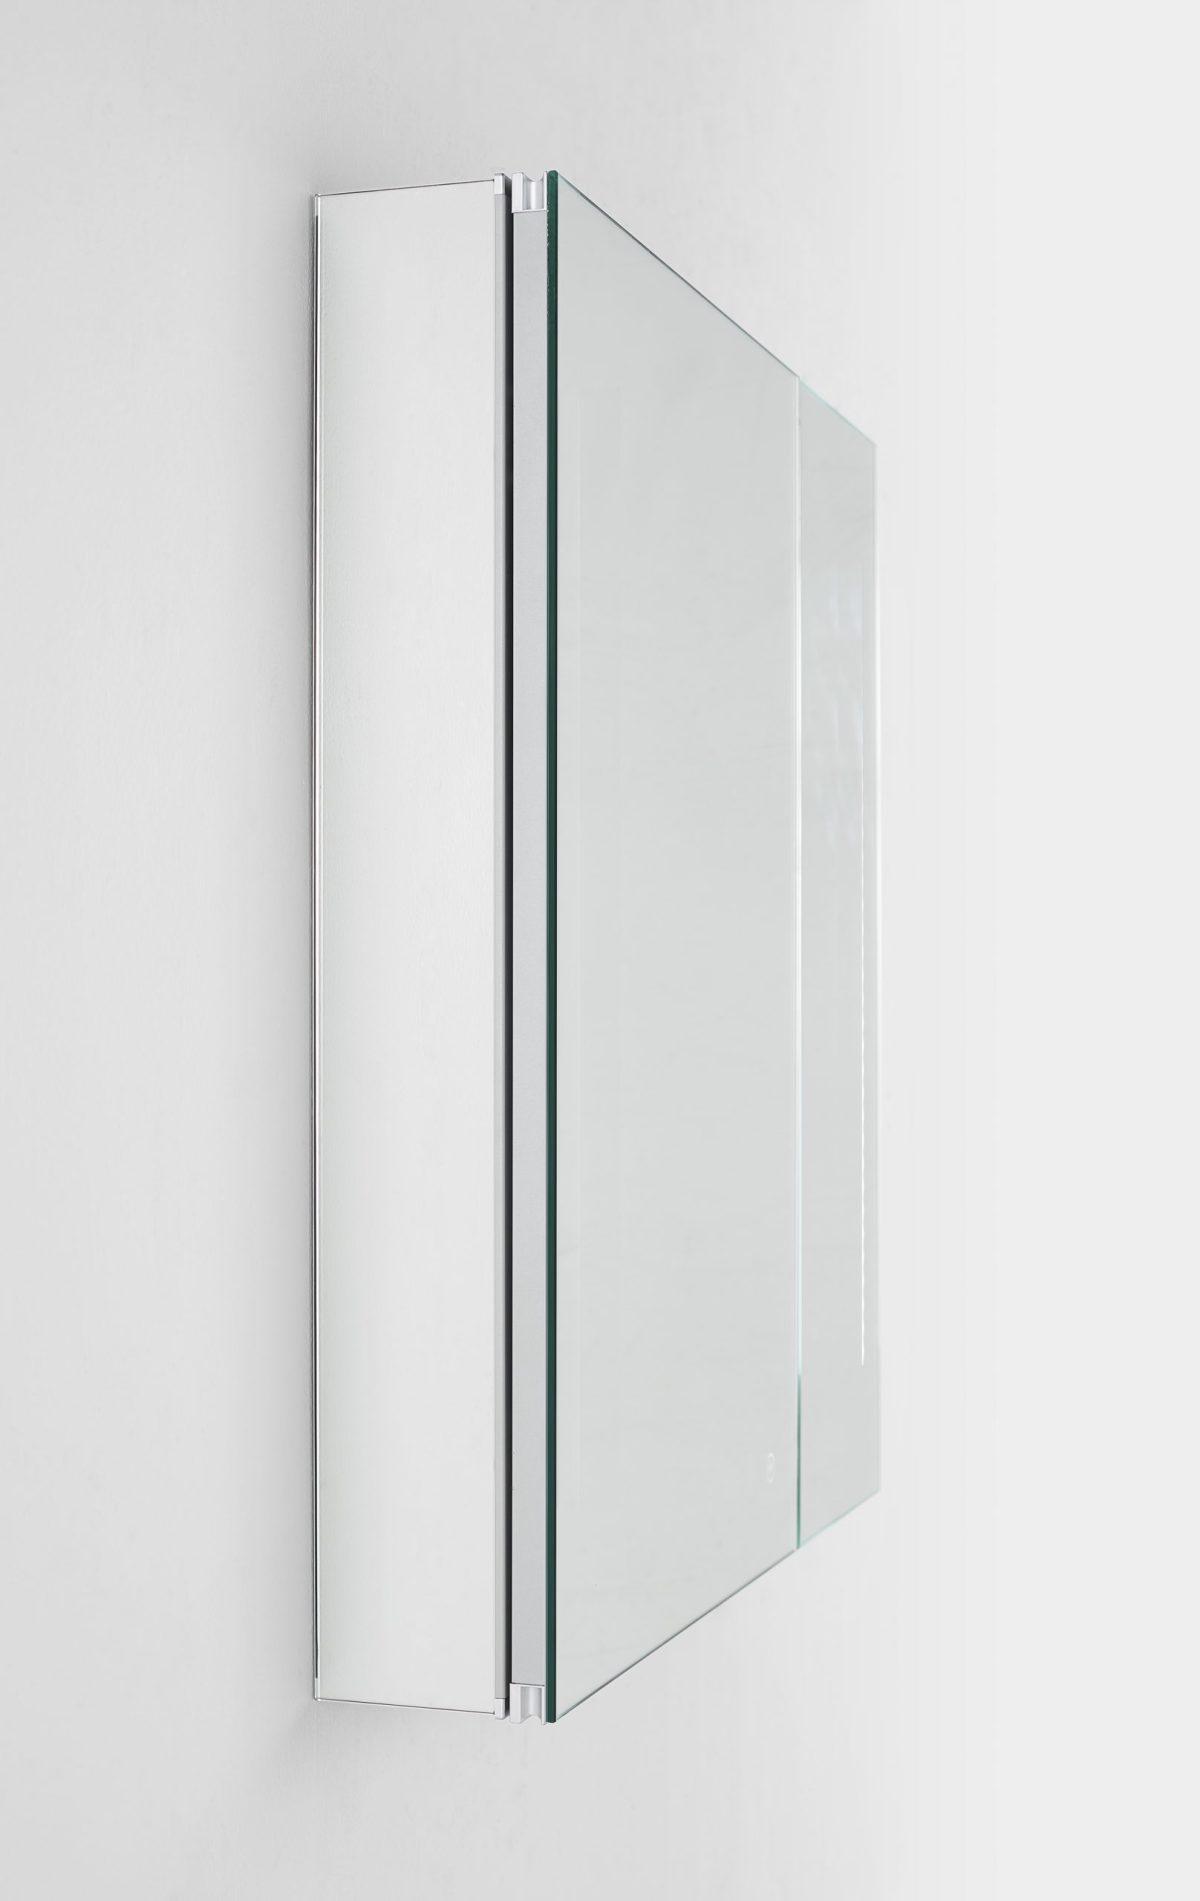 AQUADOM Royale 36 inches x 30 inches Medicine Mirror Glass Cabinet for Bathroom